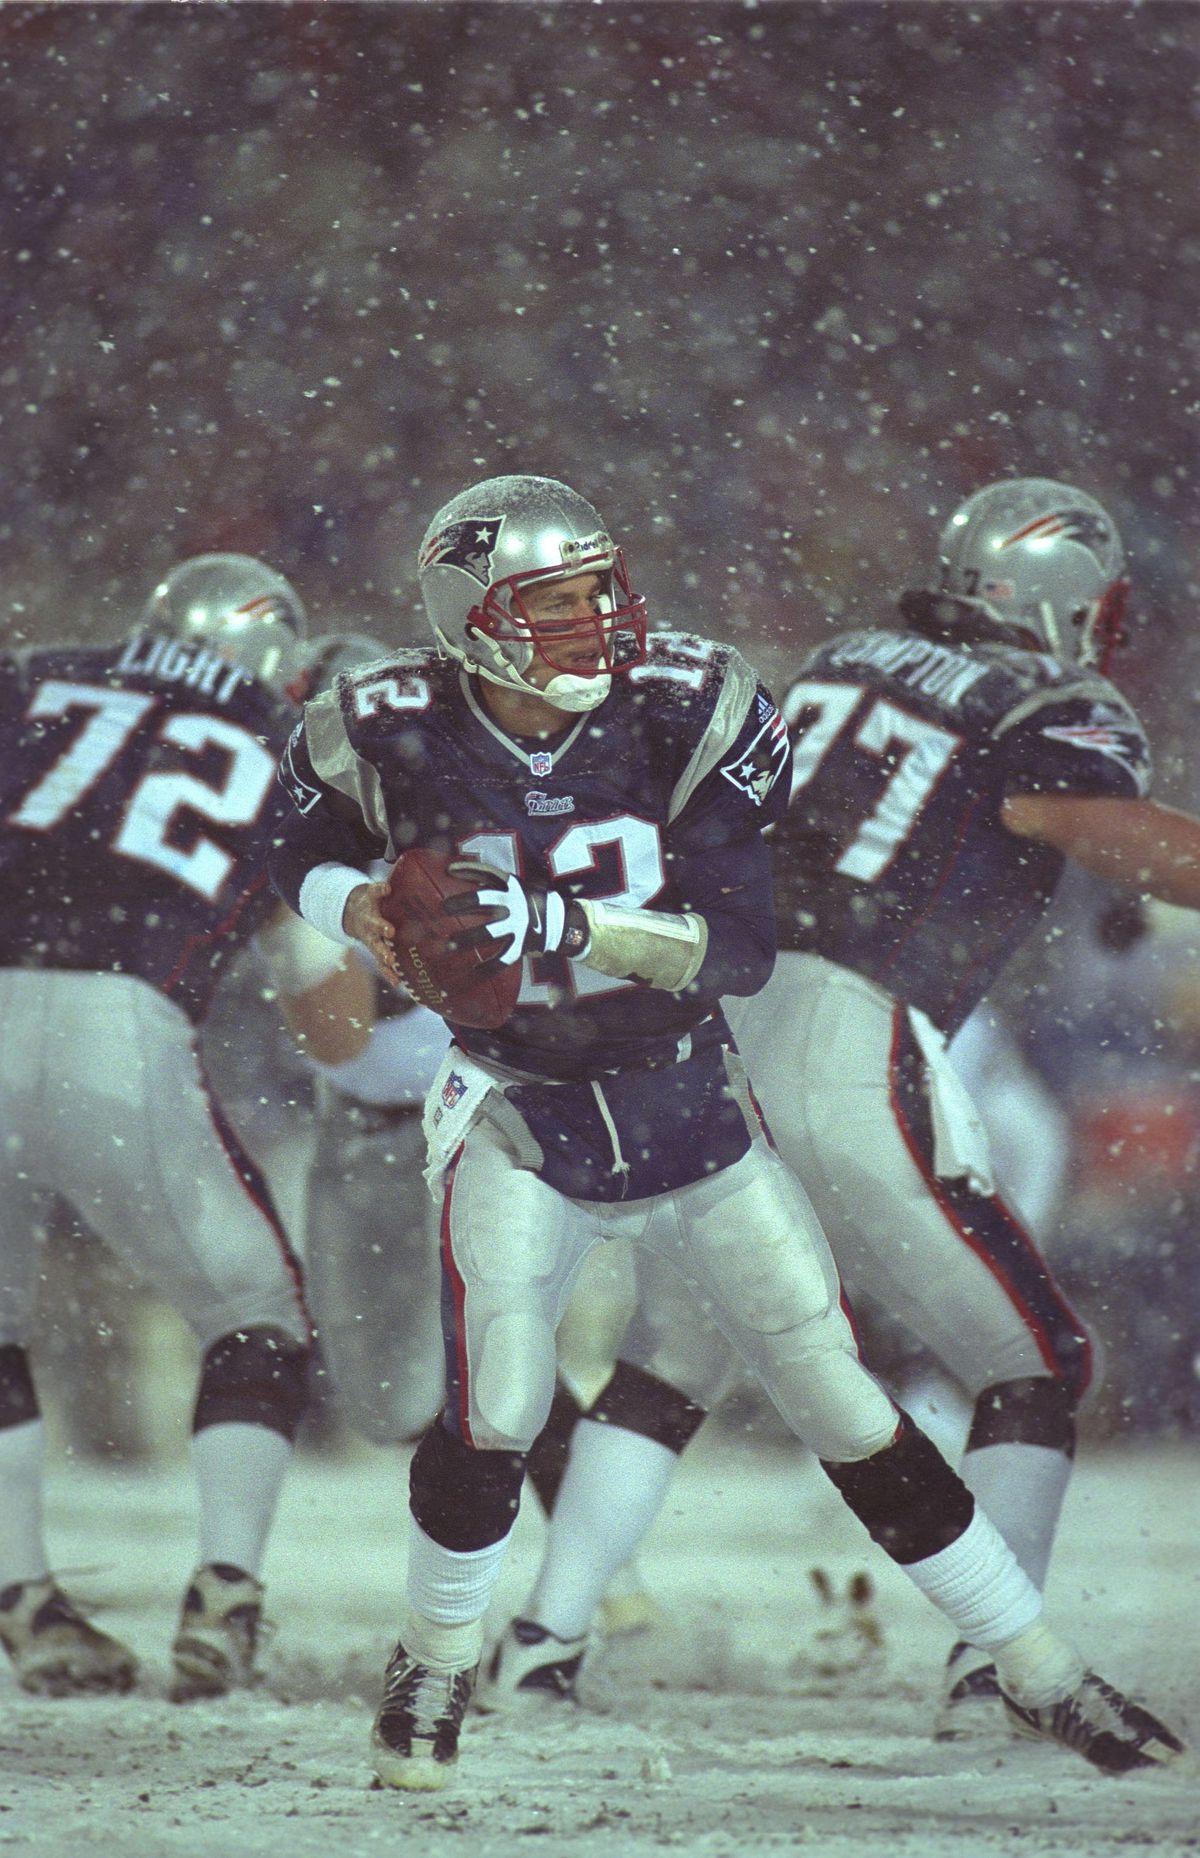 NFL 2002: Patriots vs Raiders